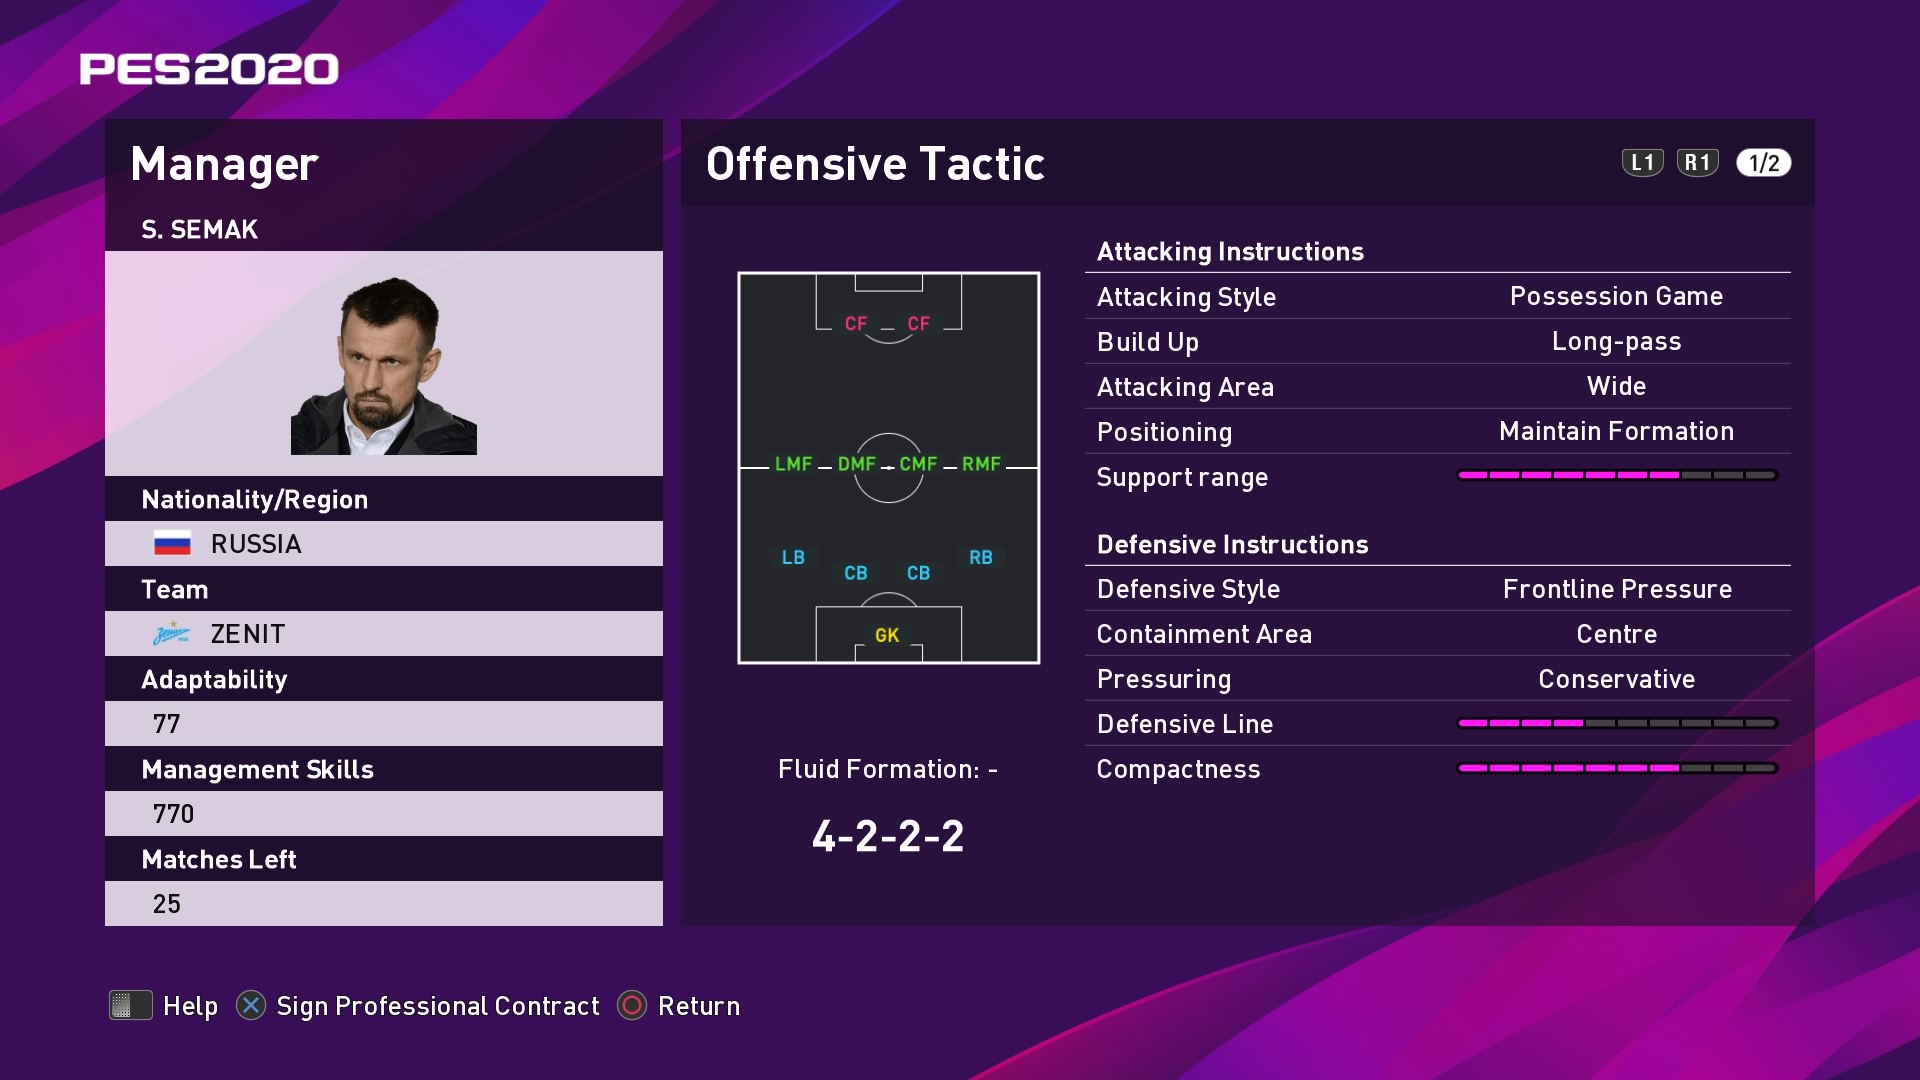 S. Semak (Sergei Semak) Offensive Tactic in PES 2020 myClub